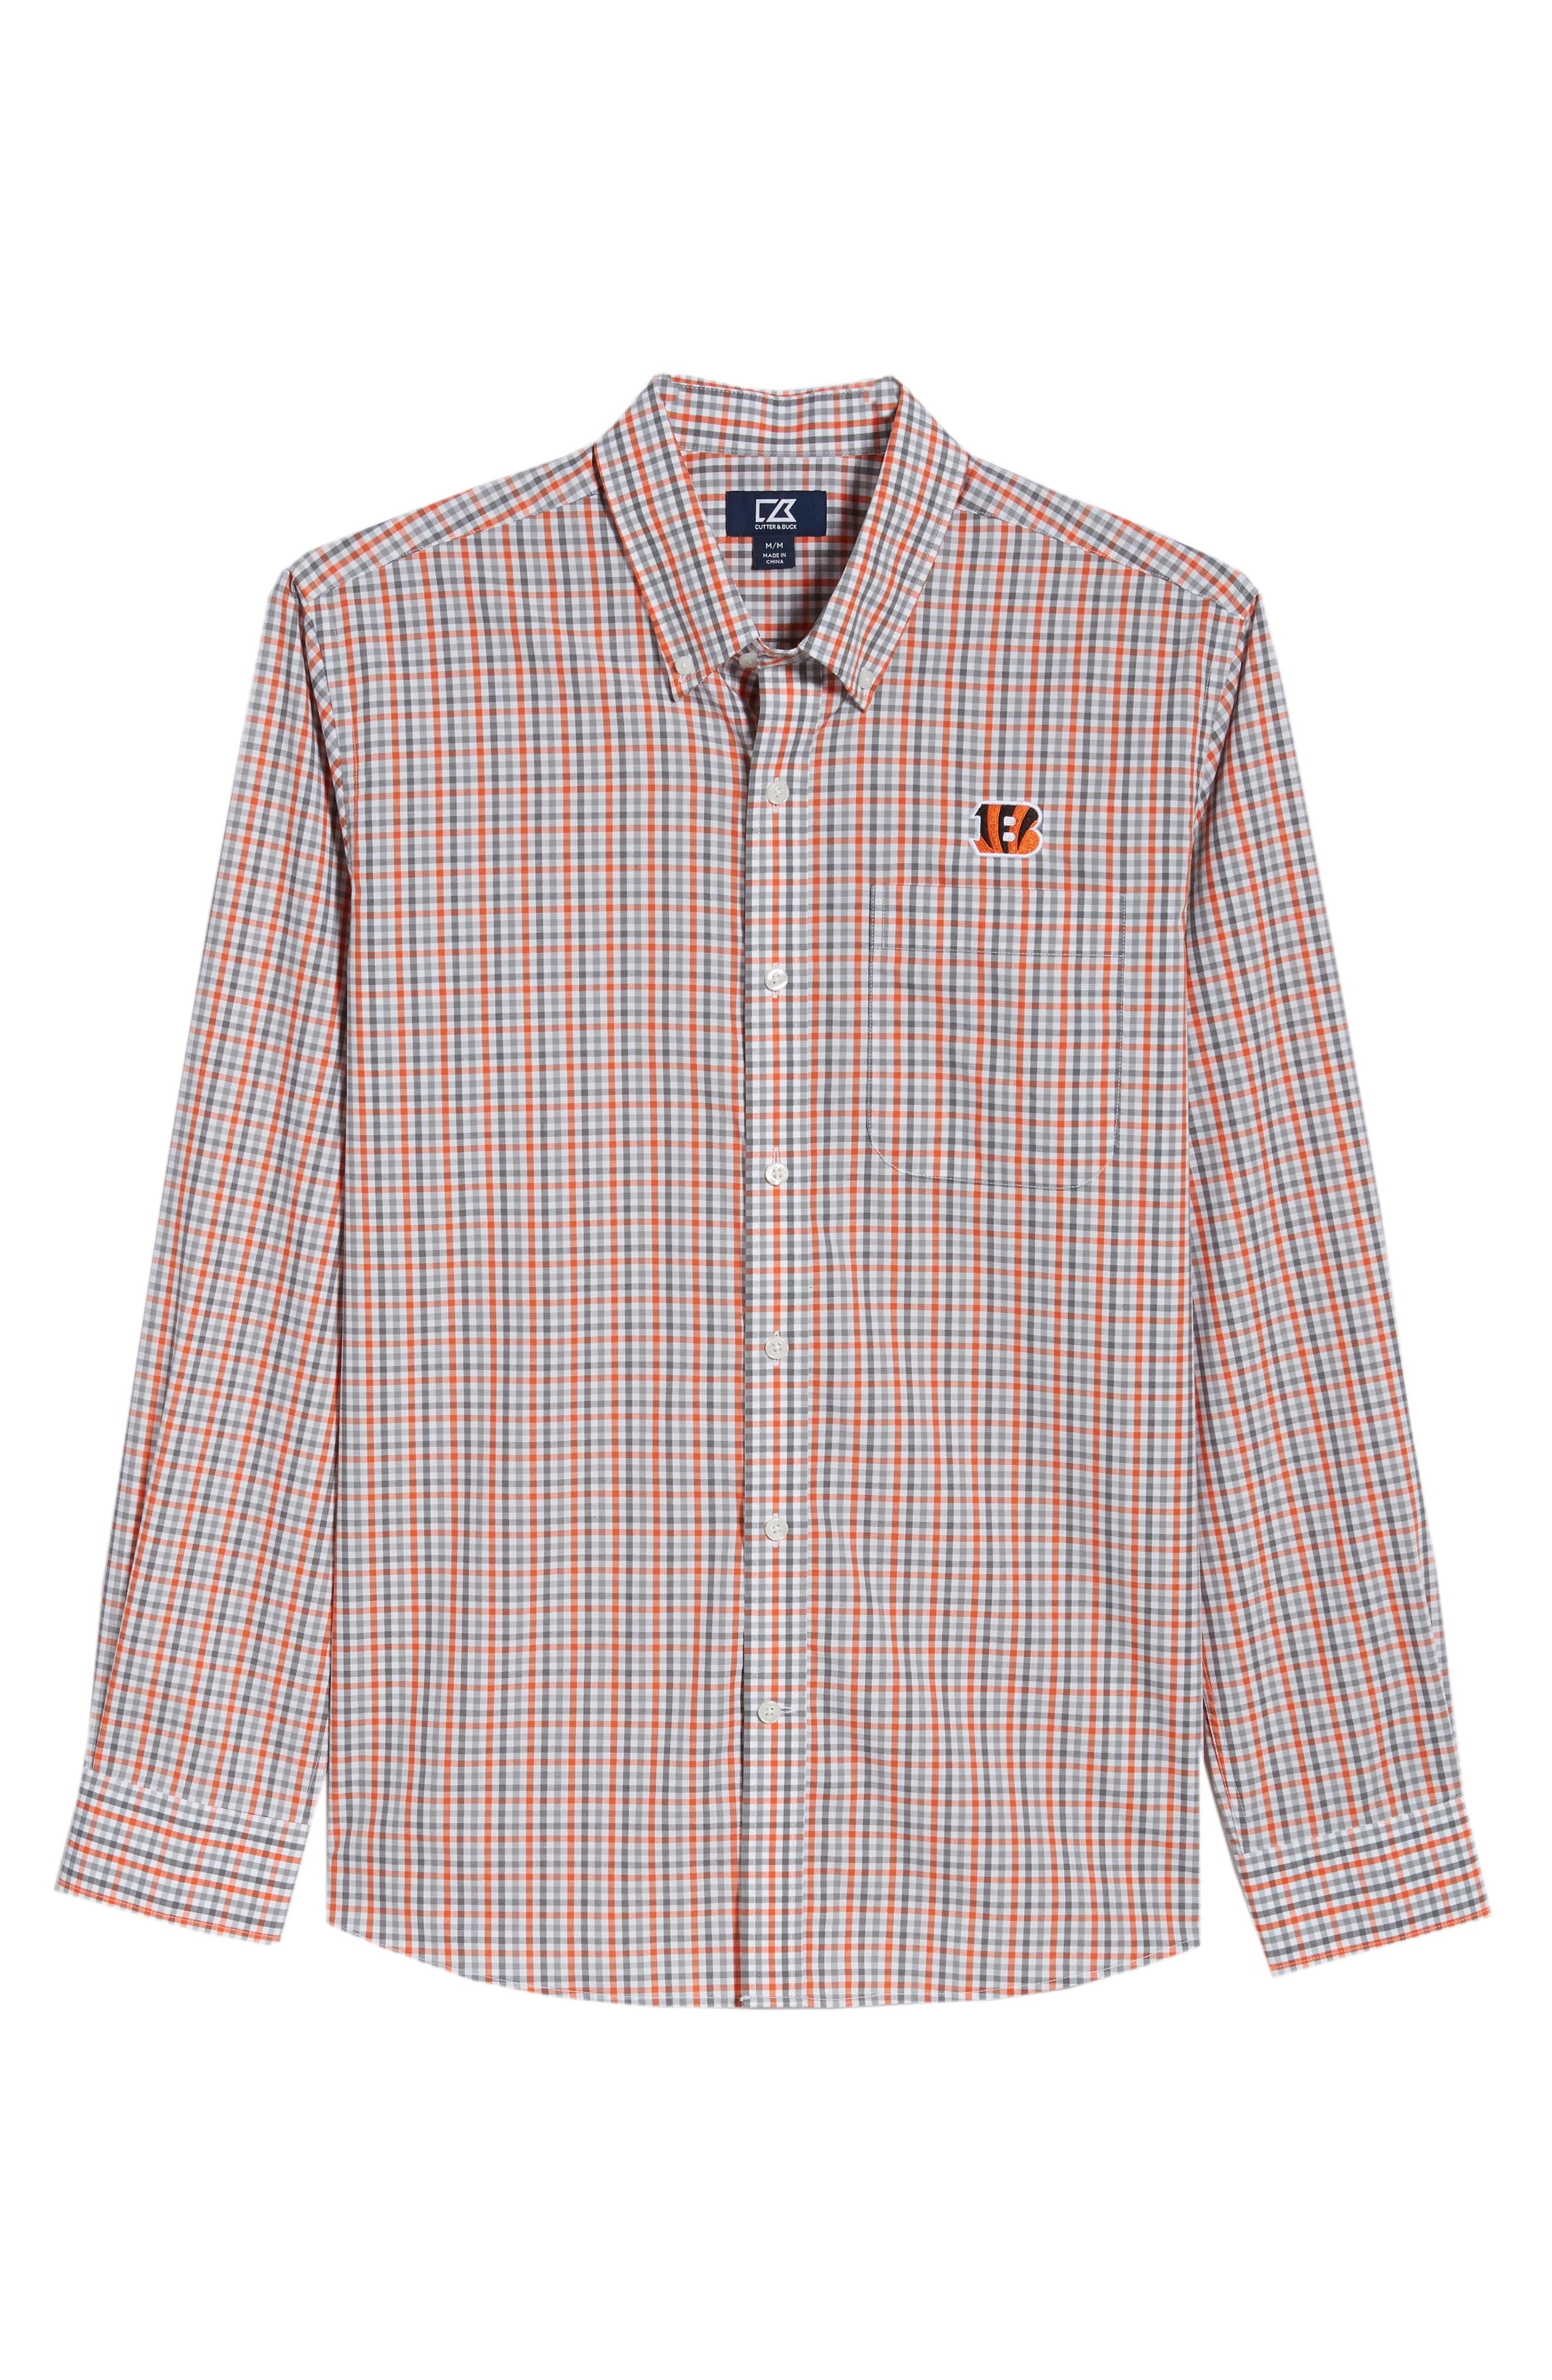 Cincinnati Bengals - Gilman Regular Fit Plaid Sport Shirt,                             Alternate thumbnail 6, color,                             COLLEGE ORANGE